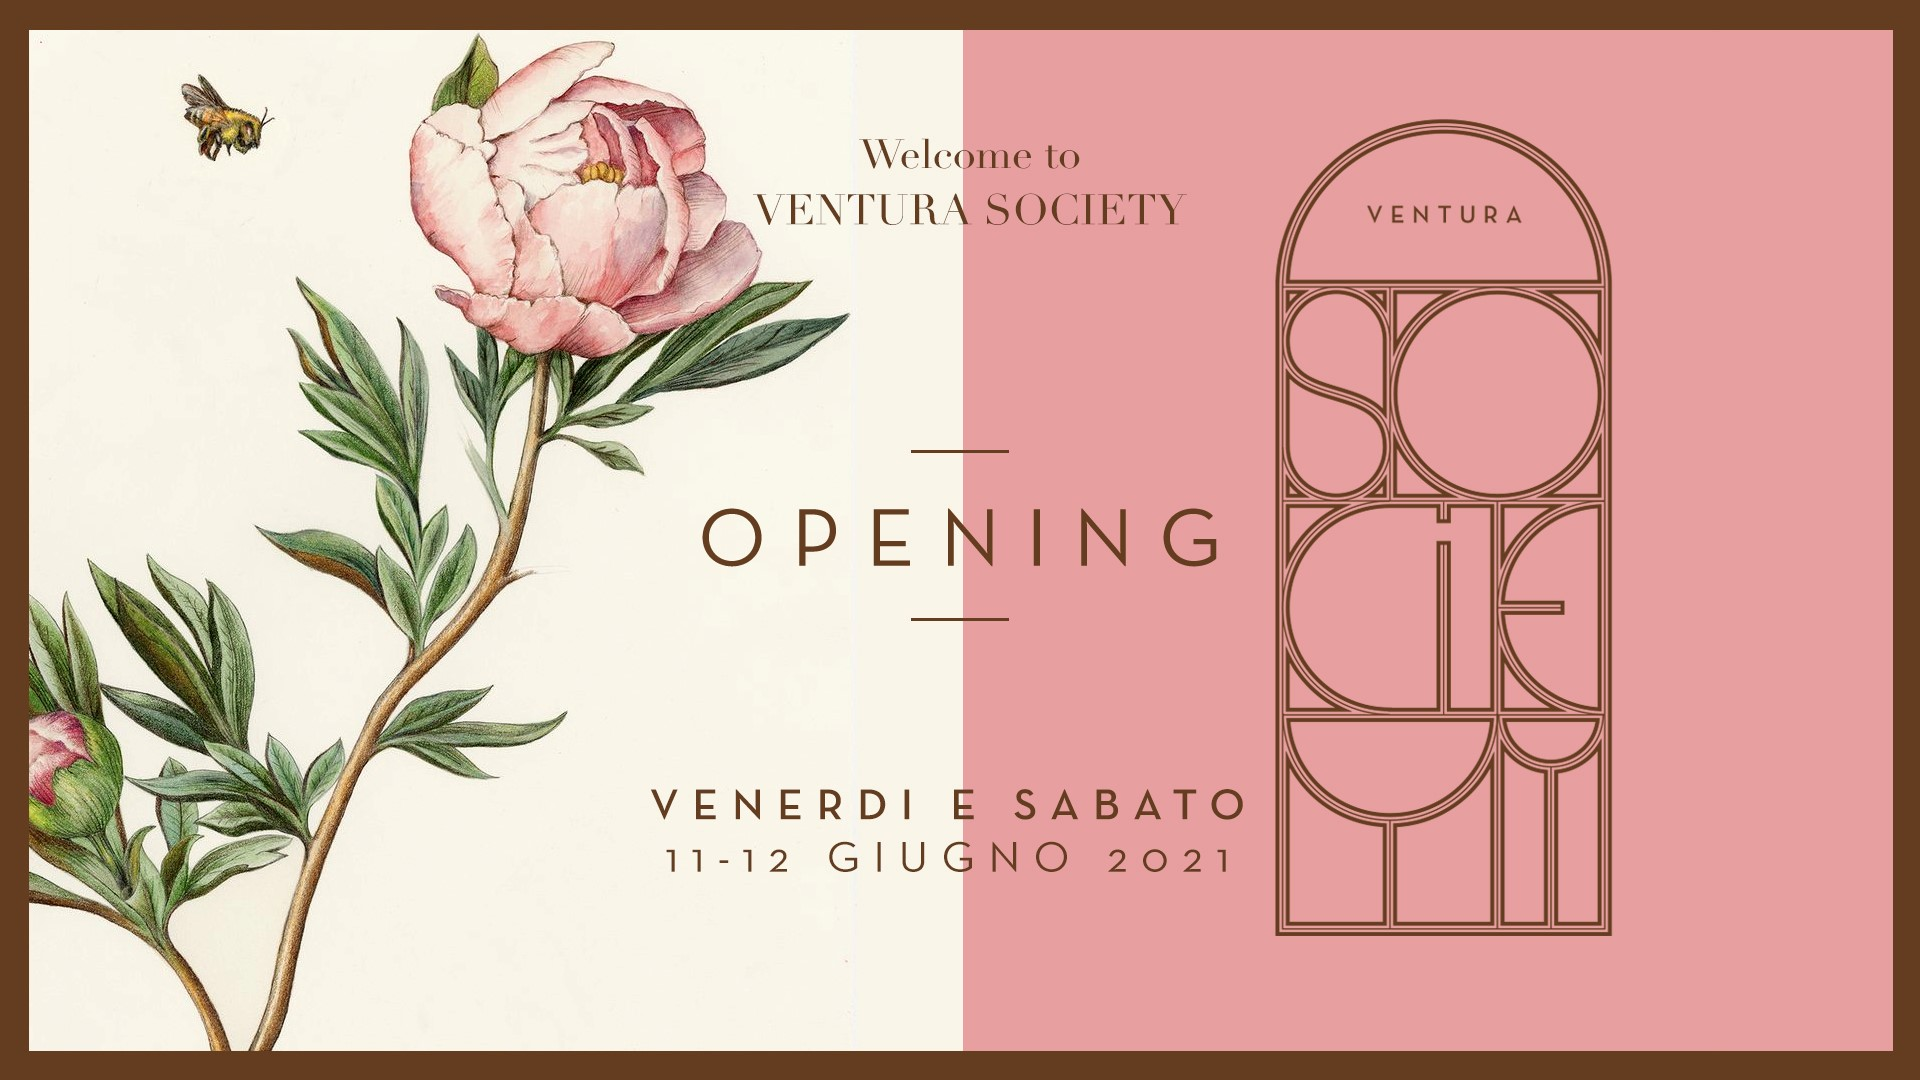 VENTURA SOCIETY ❃ Welcome ❃ YOUparti